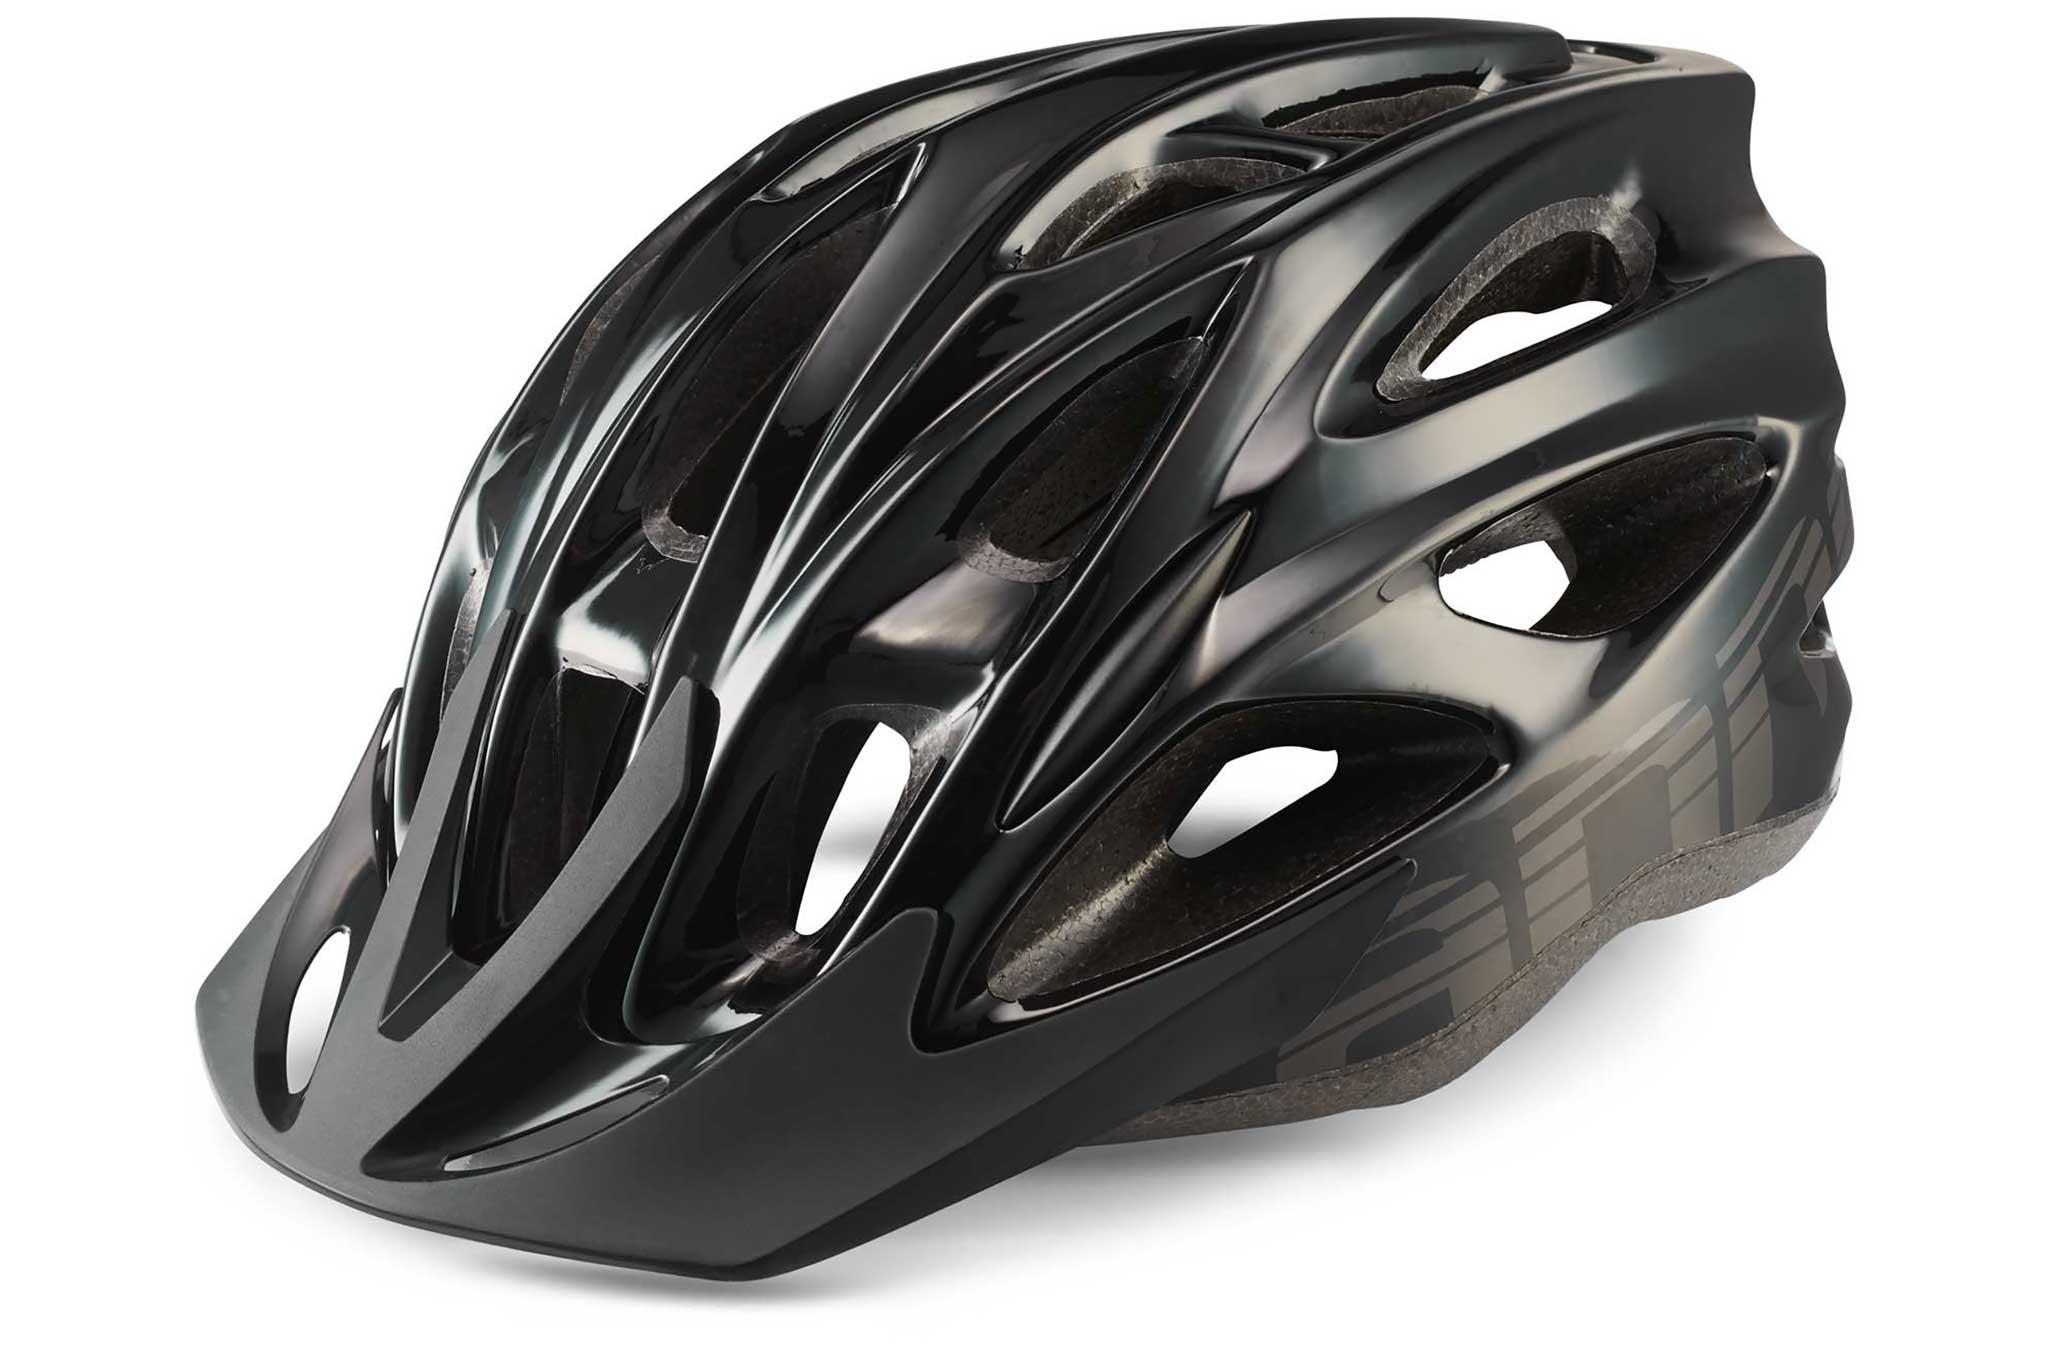 Bike helmet Cannondale Quick Leisure Black (size S/M) - £14 @ Evans Cycles (Free Click & Collect)